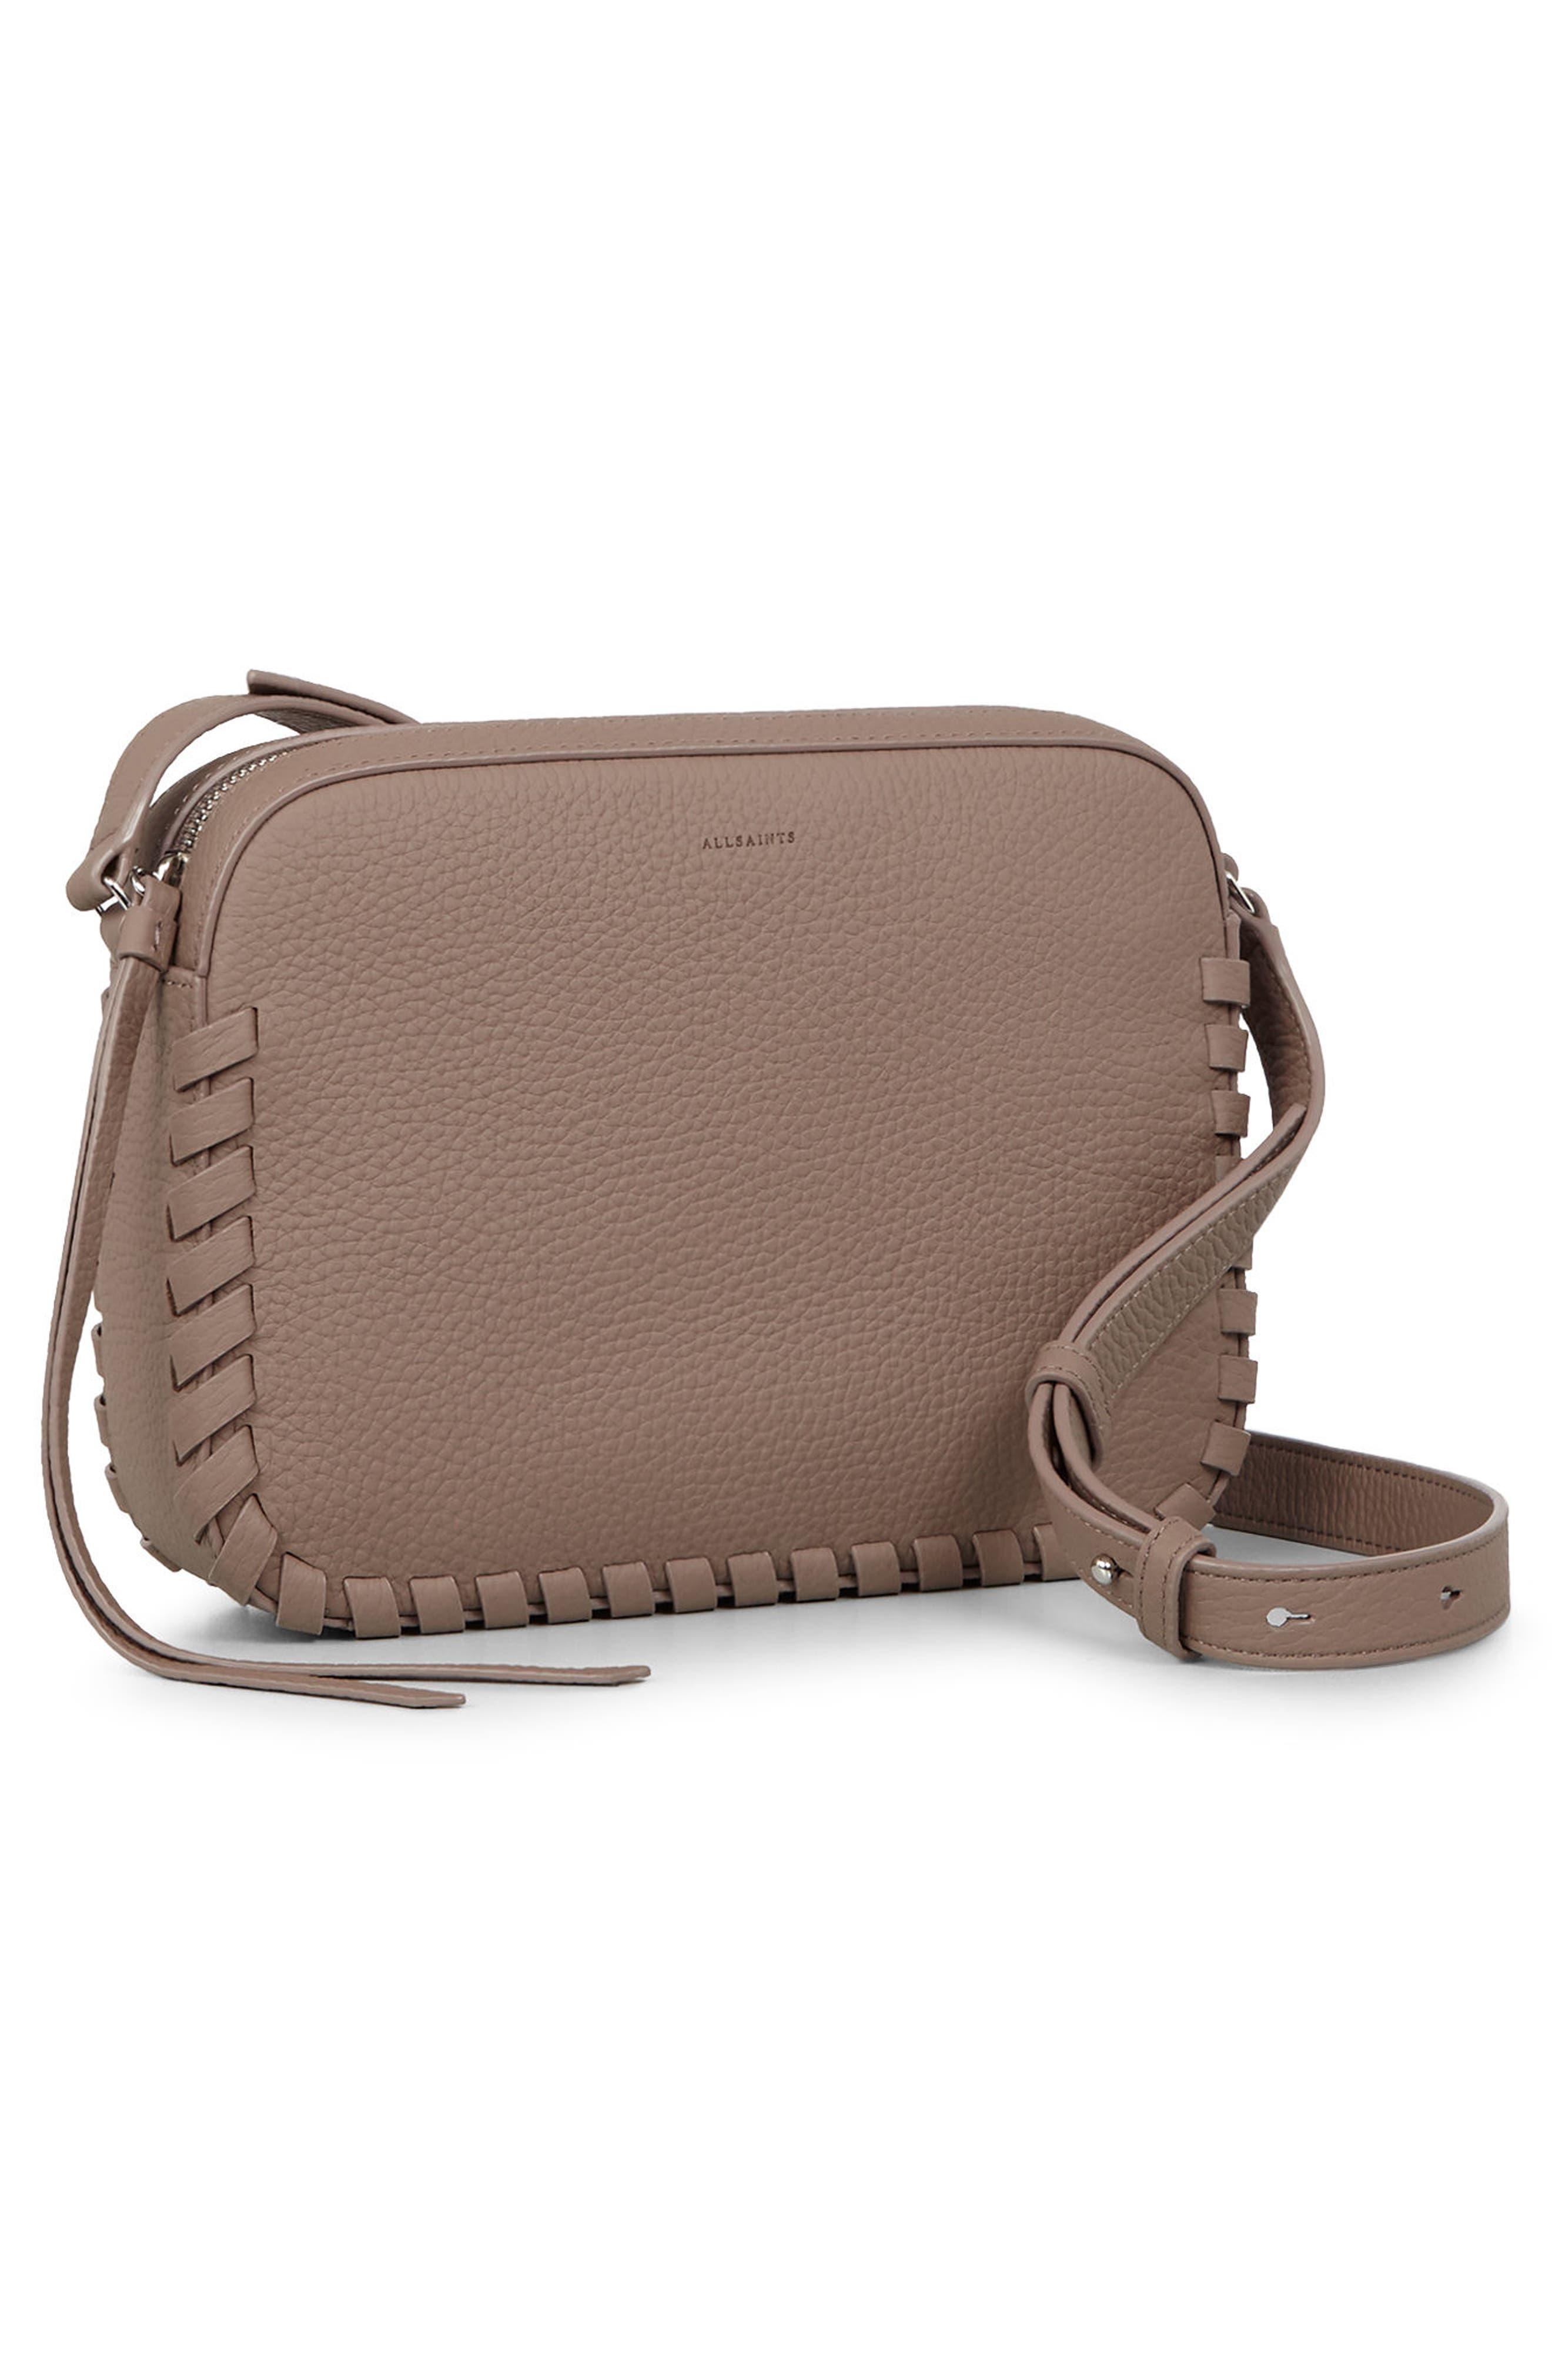 Kepi Mini Leather Crossbody Bag,                             Alternate thumbnail 8, color,                             ALMOND BROWN